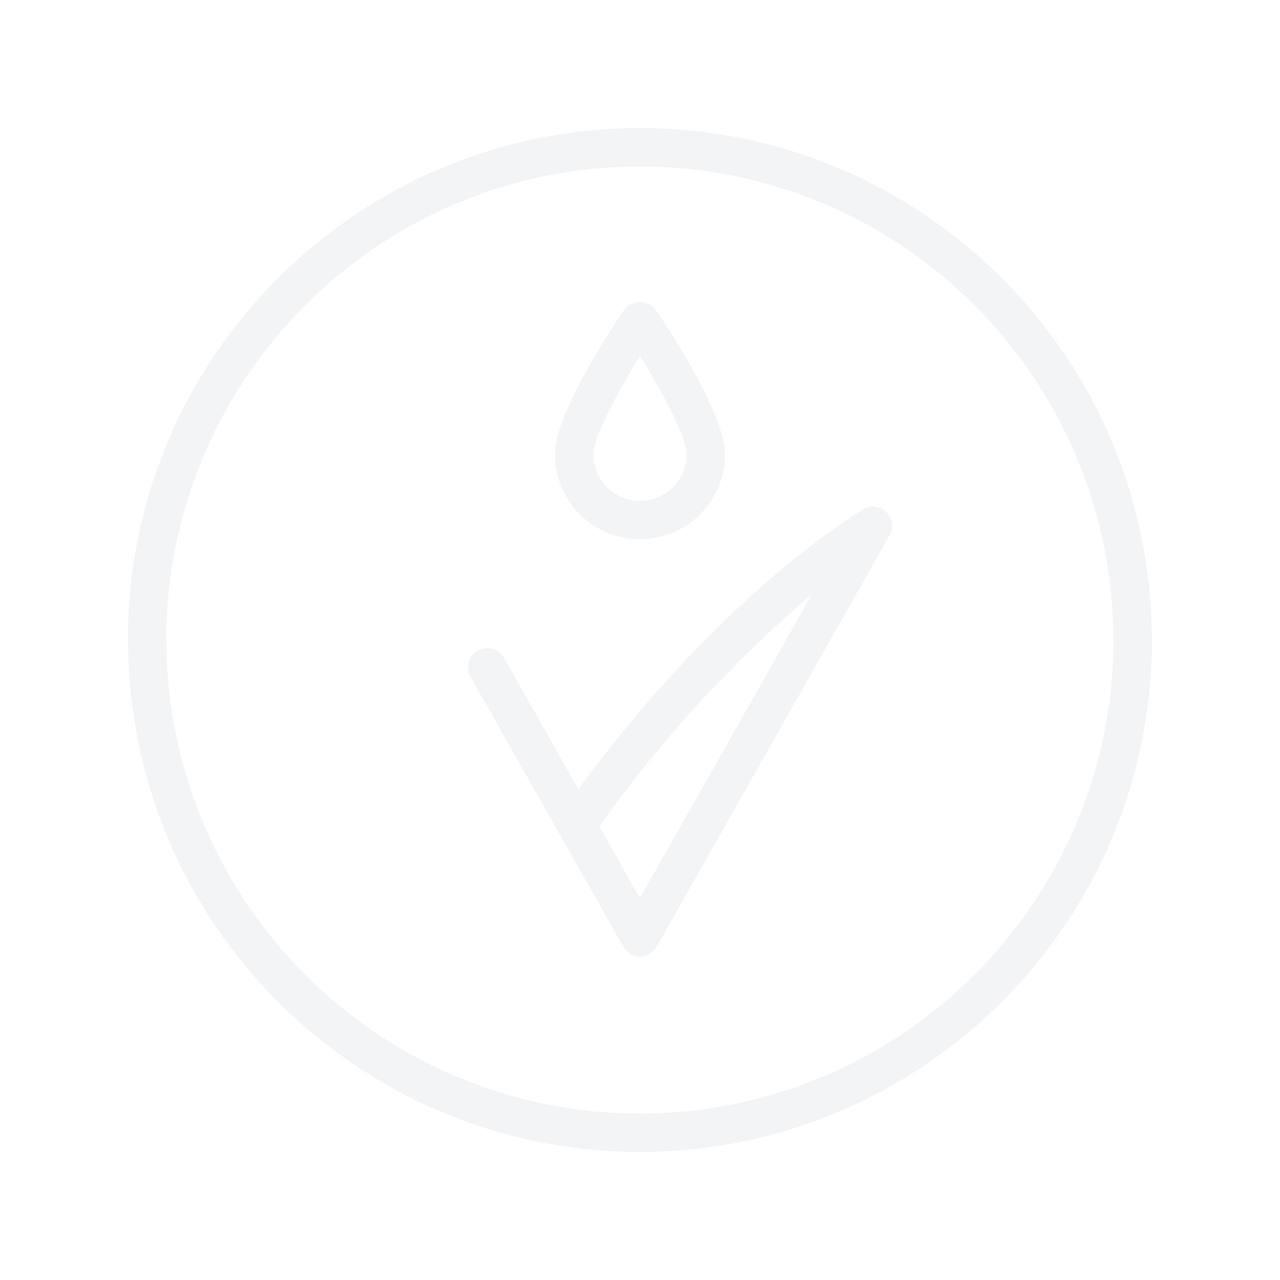 MIZON Joyful Time Essence Acerola Mask 23g тканевая маска для лица